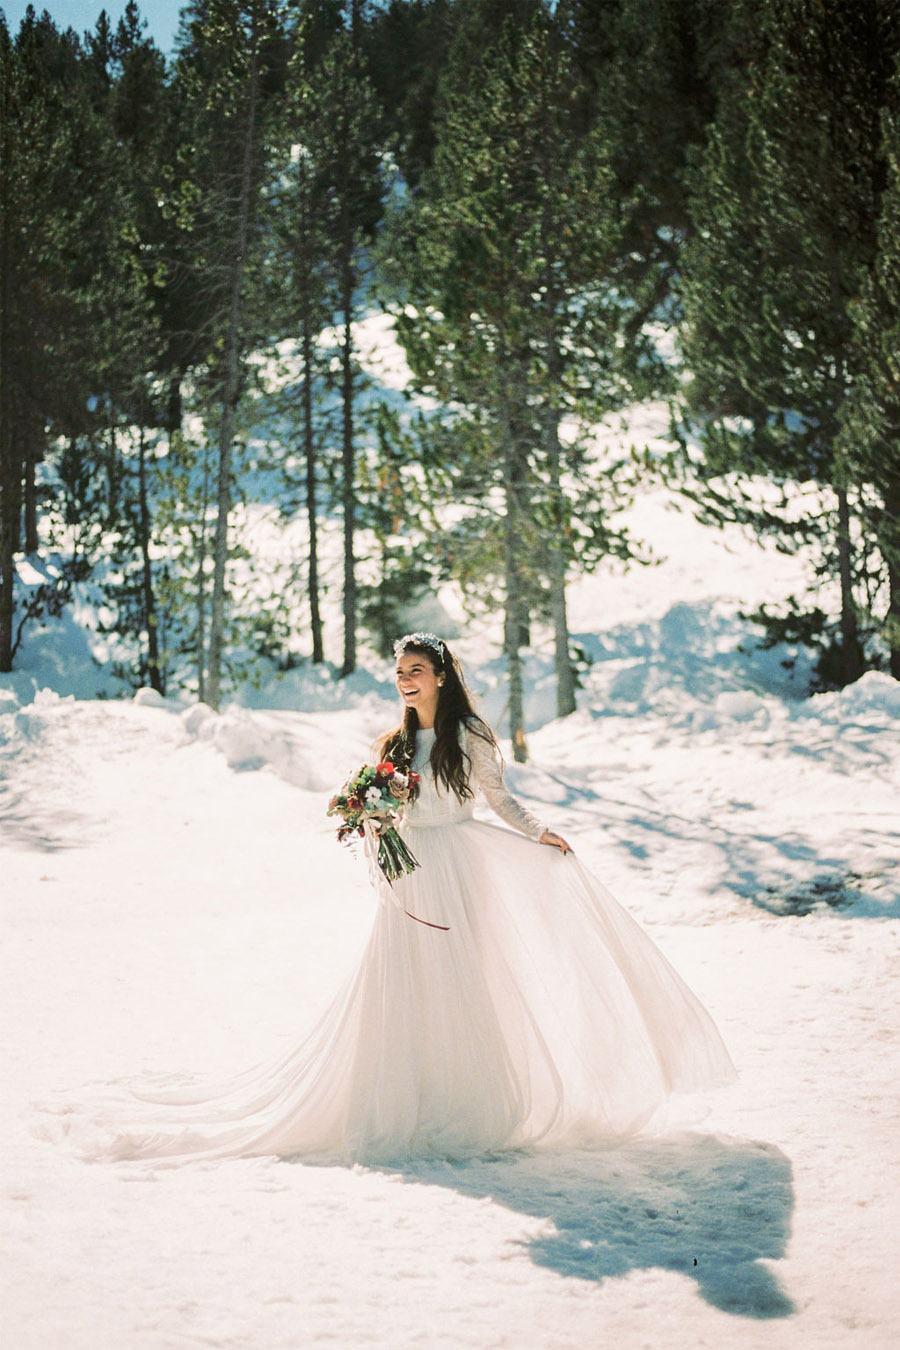 UNA ROMÁNTICA BODA DE INVIERNO novia-grandvalira